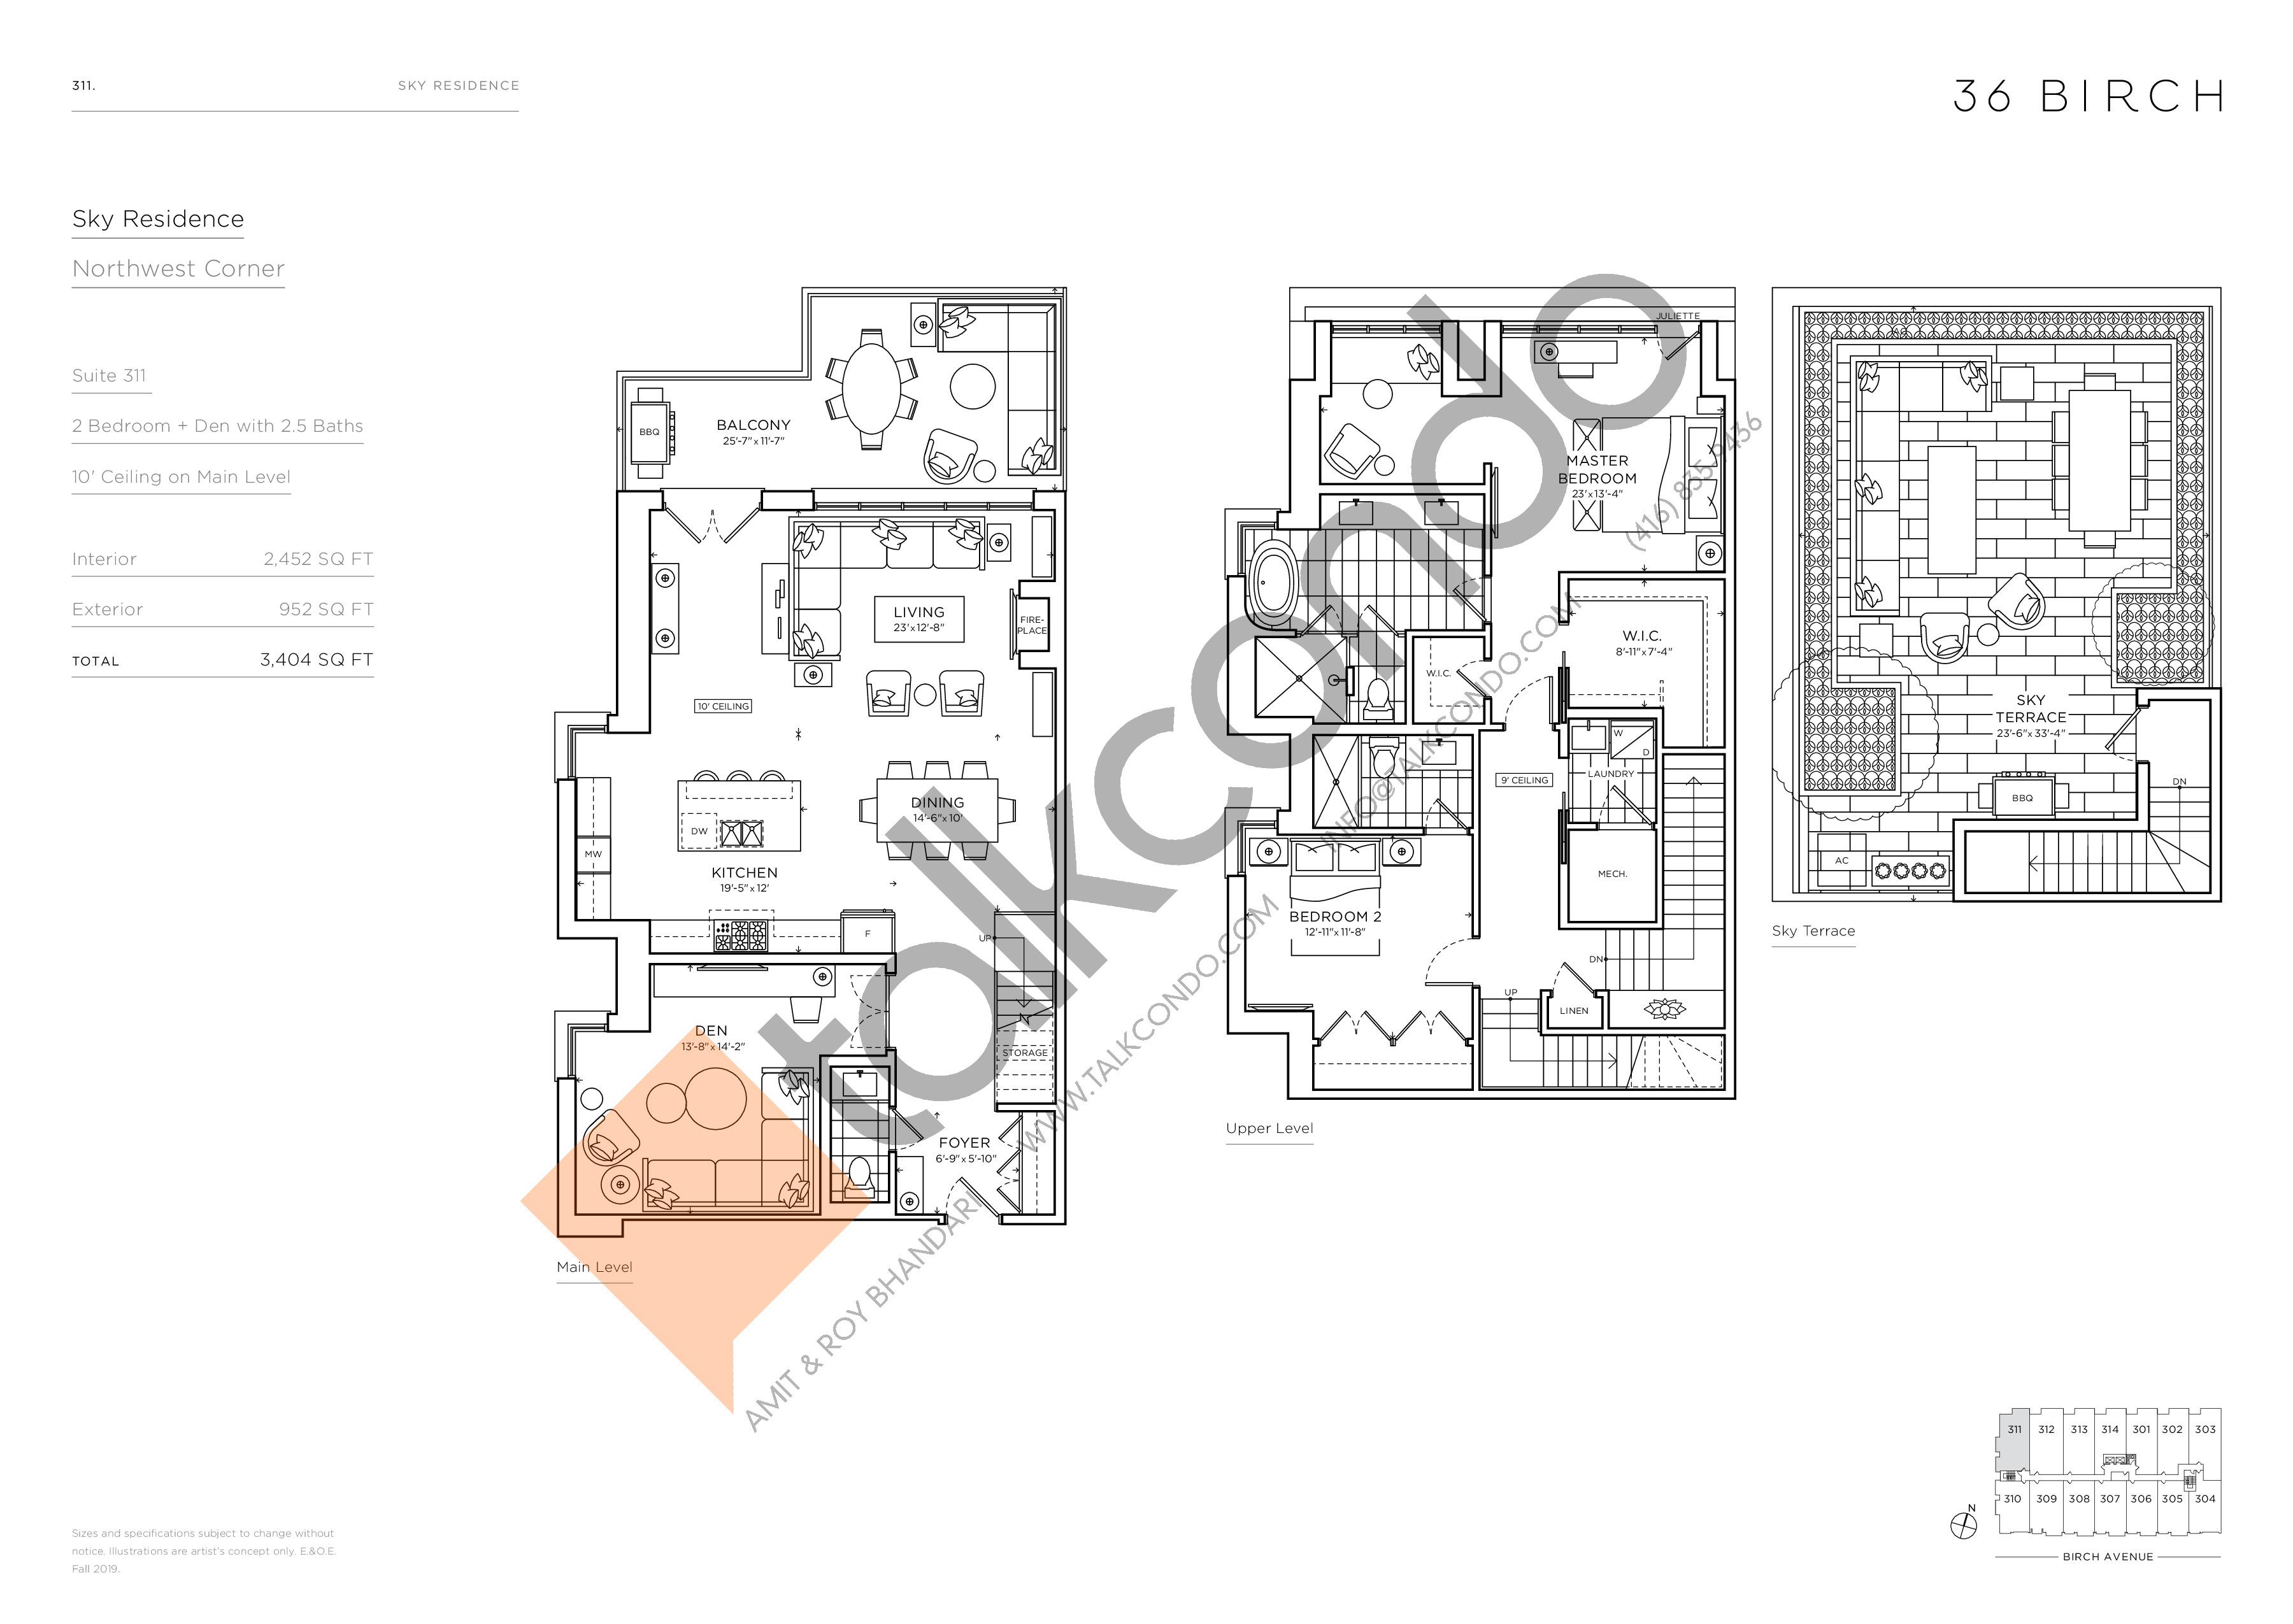 311 - Sky Residence Floor Plan at 36 Birch Condos - 2452 sq.ft